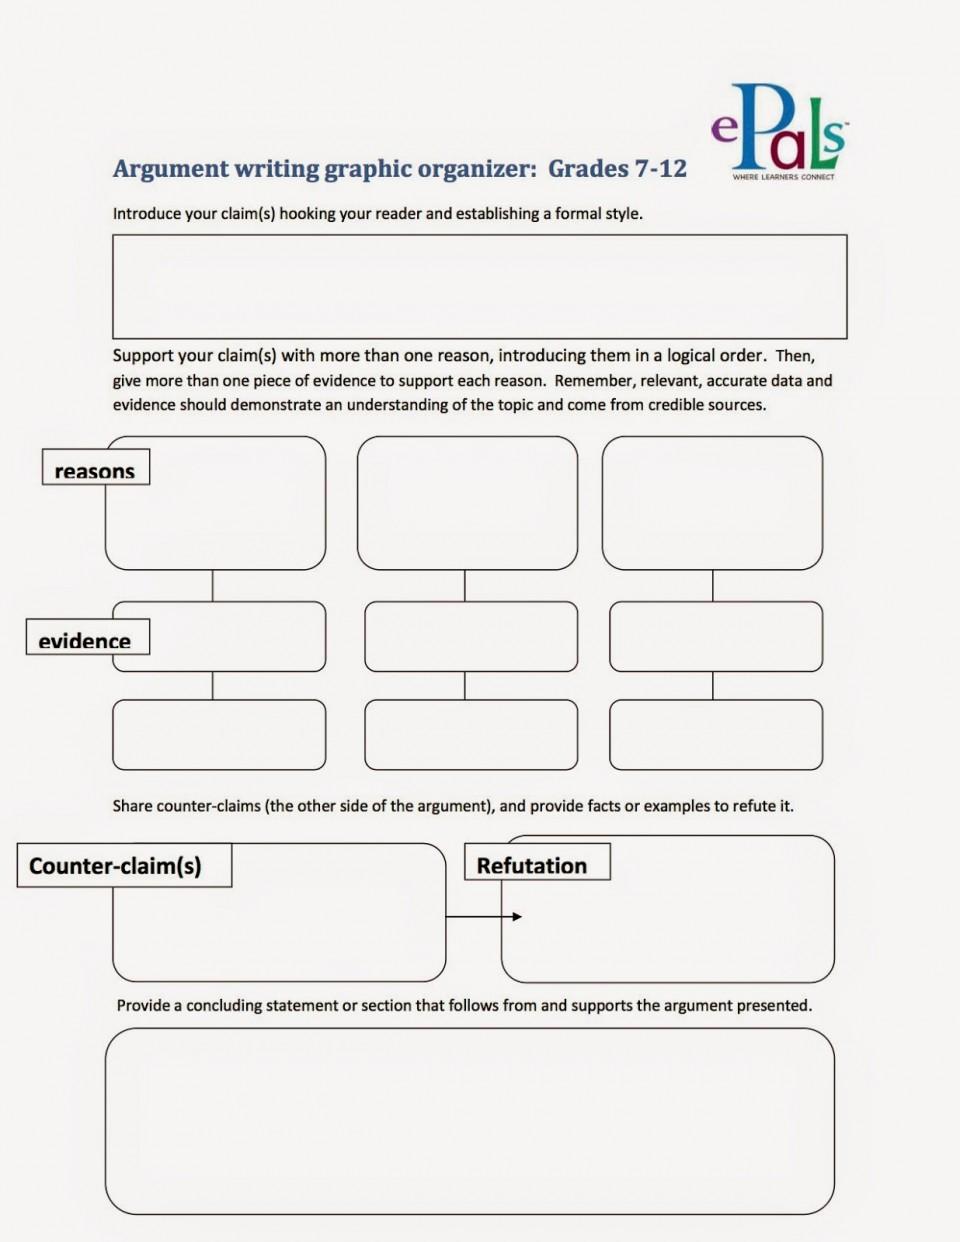 005 Argumentgraphicorganizer2bcopy Argument Essay Graphic Organizer Breathtaking Argumentative College Example Persuasive Template 960